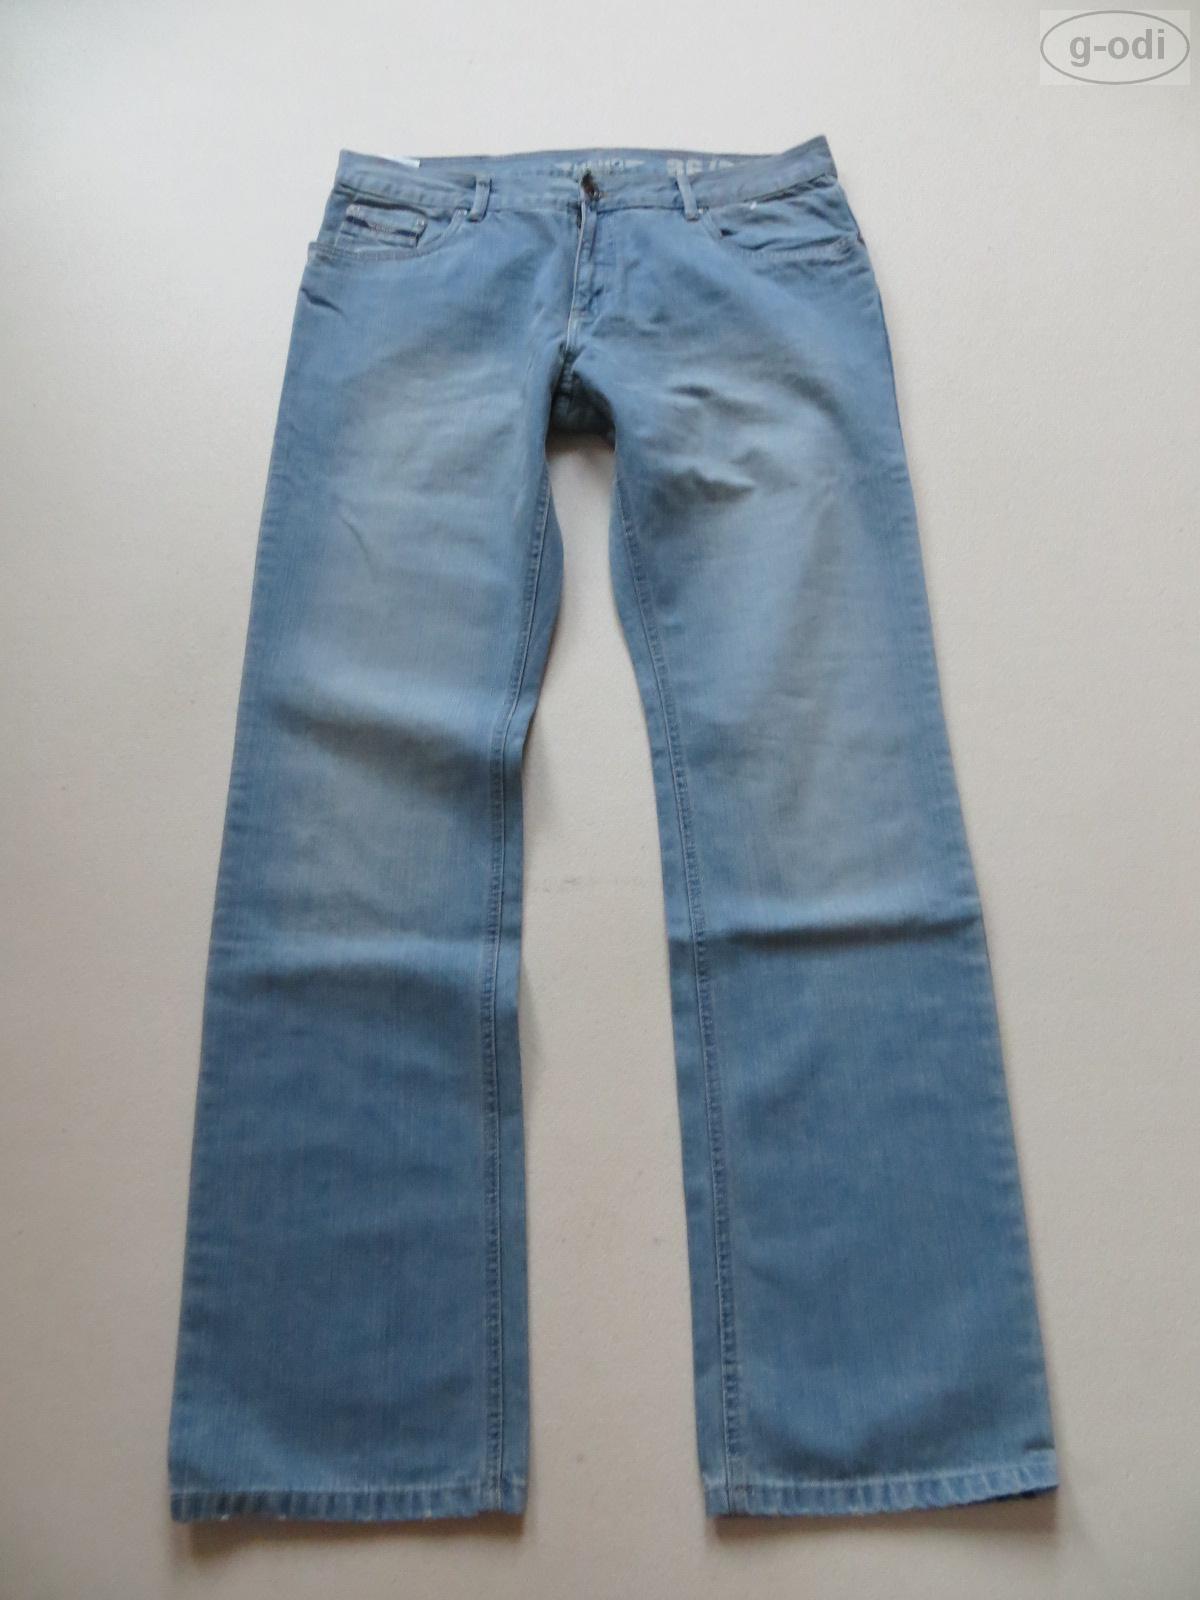 HERO by John Medoox BOSTON Jeans Hose W 34  L 32, NEU   Light wash Denim, hell